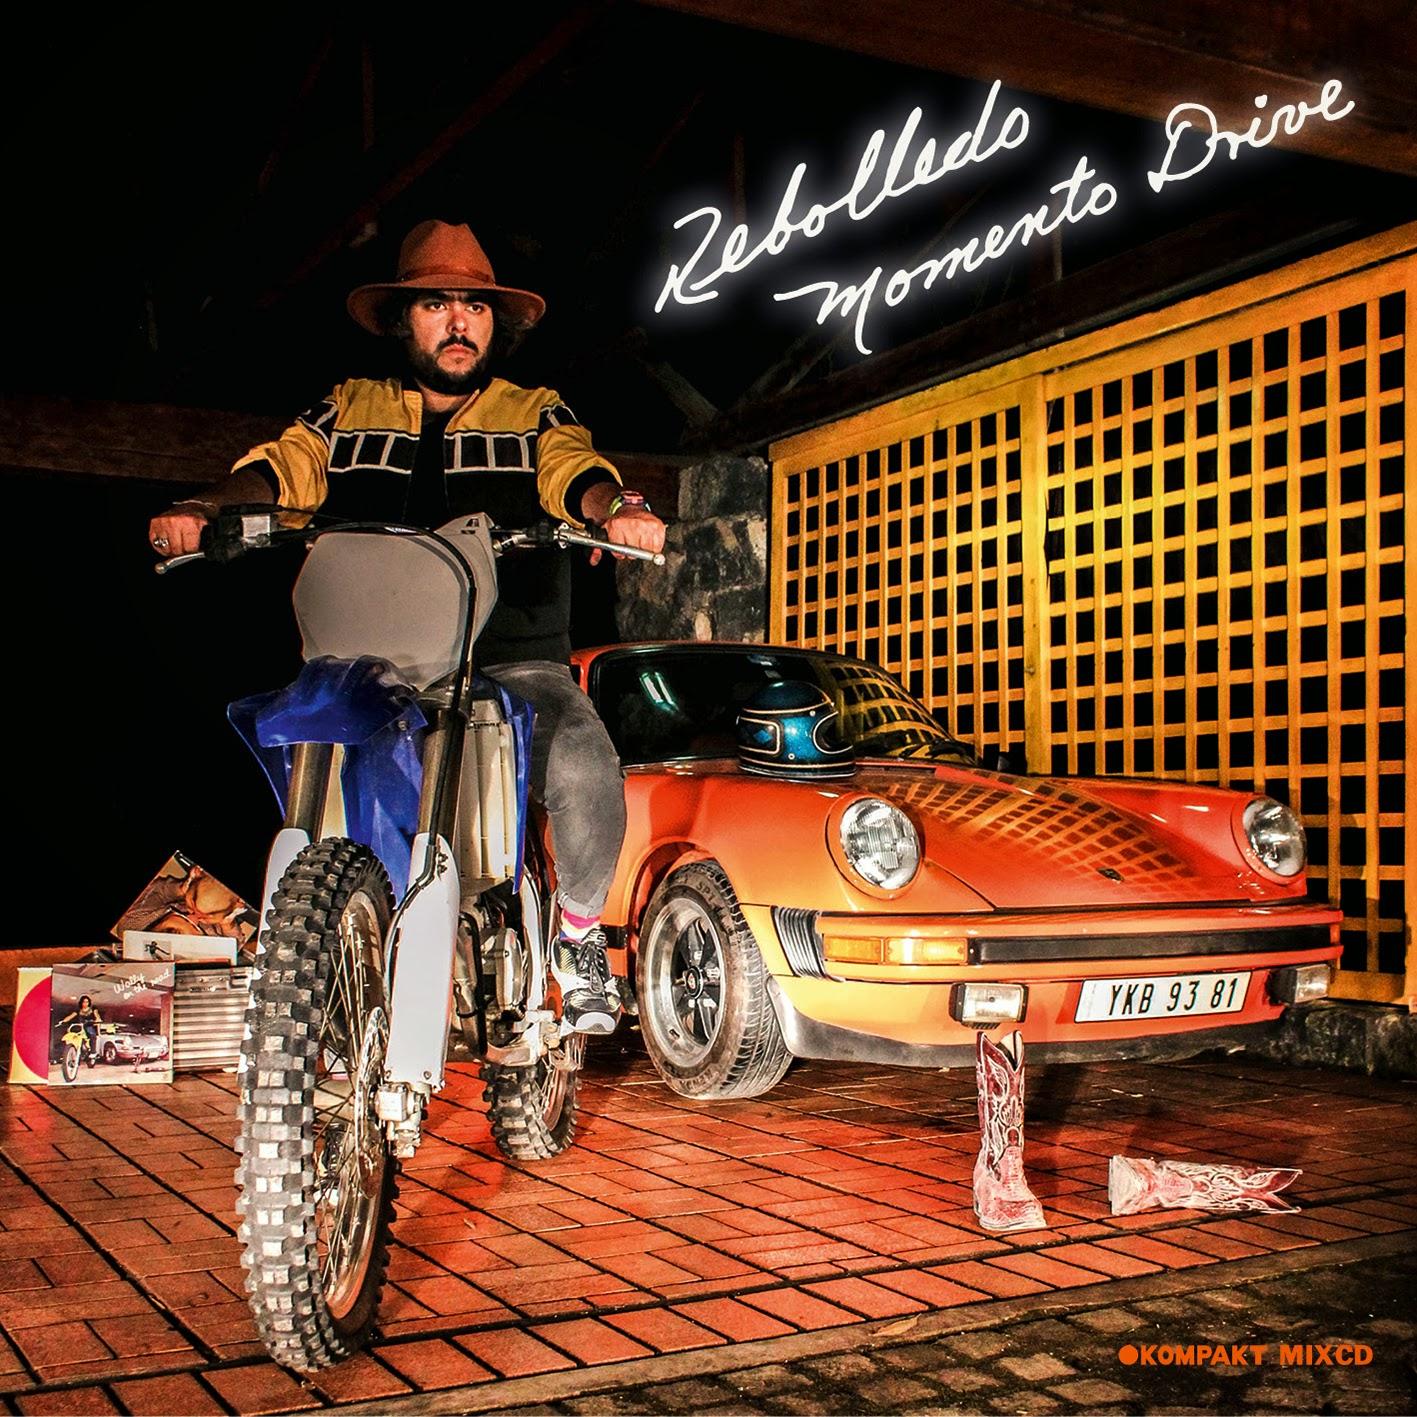 discosafari - VARIOUS ARTISTS - Rebolledo Mixes: Momento Drive - Kompakt